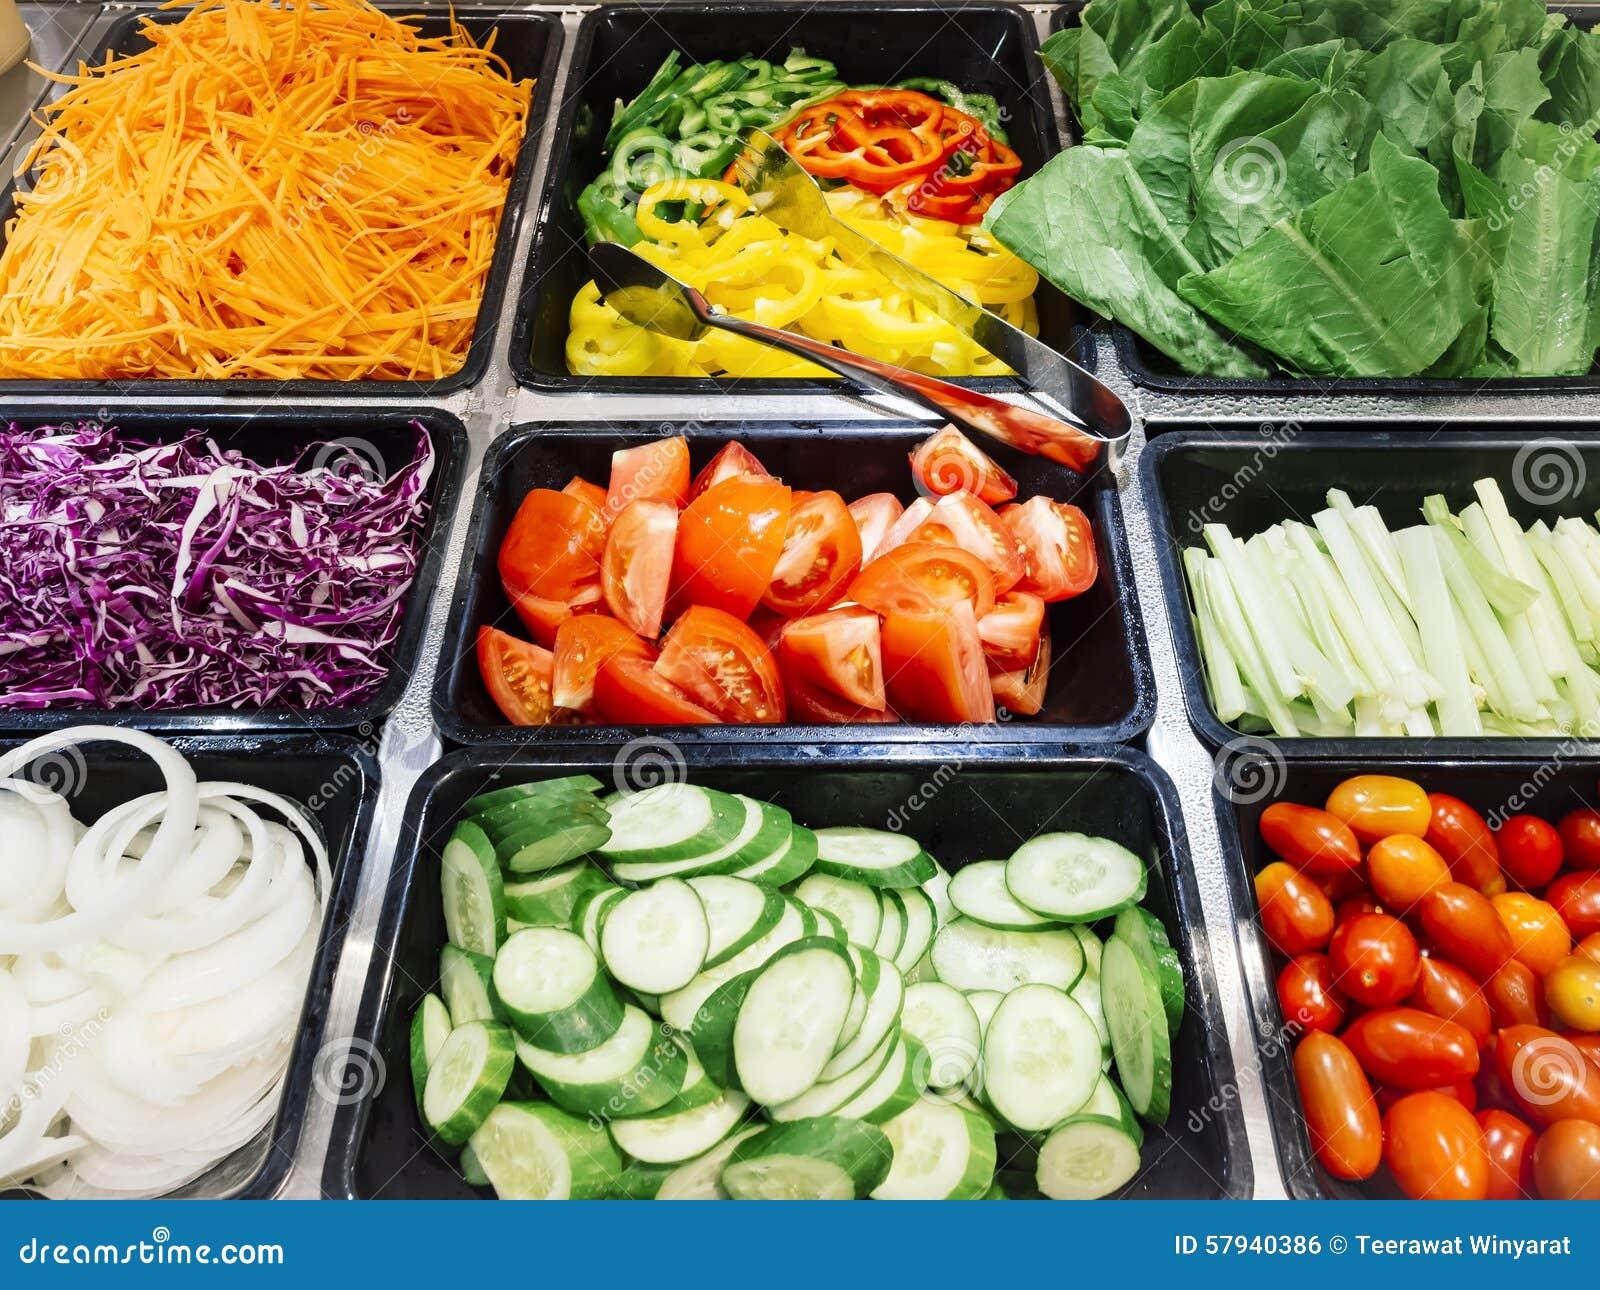 Salad Bar Fresh Vegetables Healthy Food Stock Photo